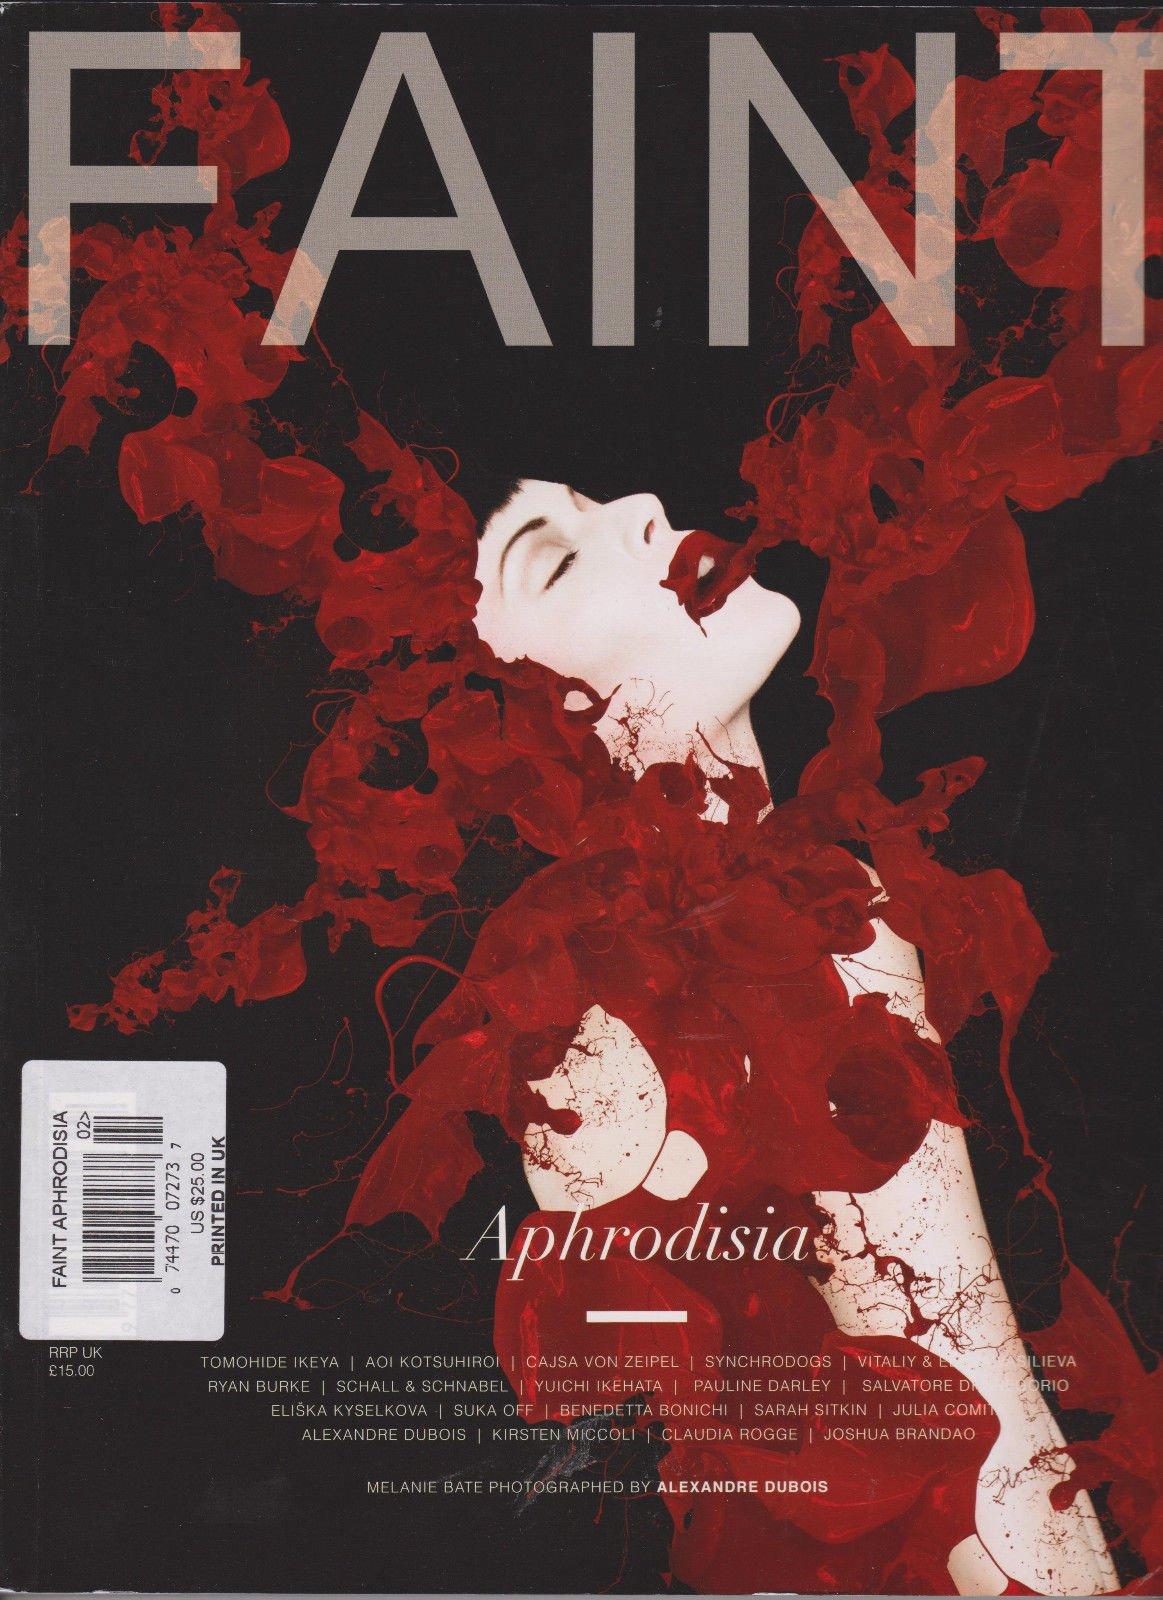 FAINT MAGAZINE UK ISSUE #2 2014, APHRODISIA.